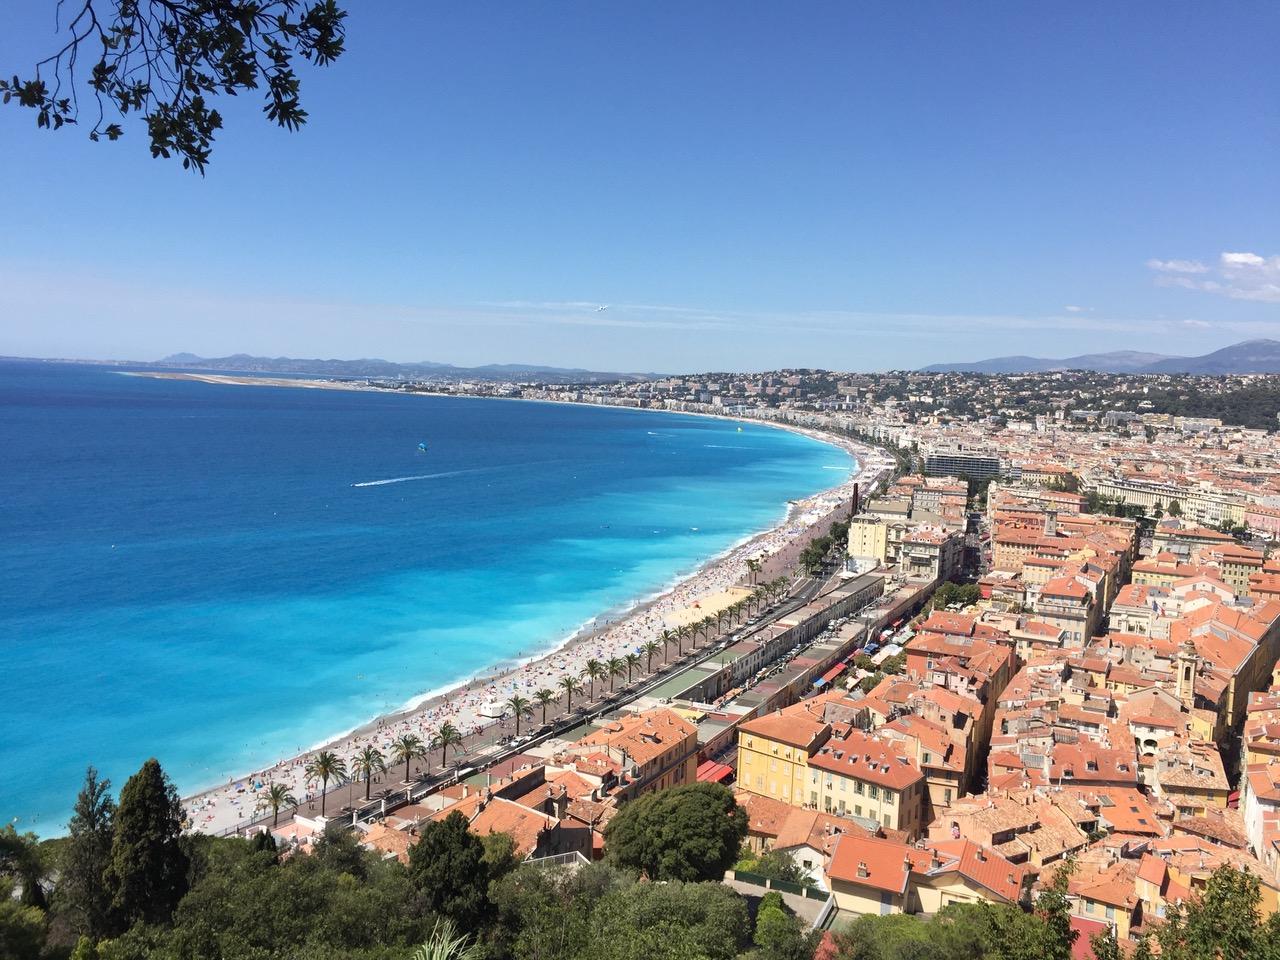 Coastal view of Nice, France.